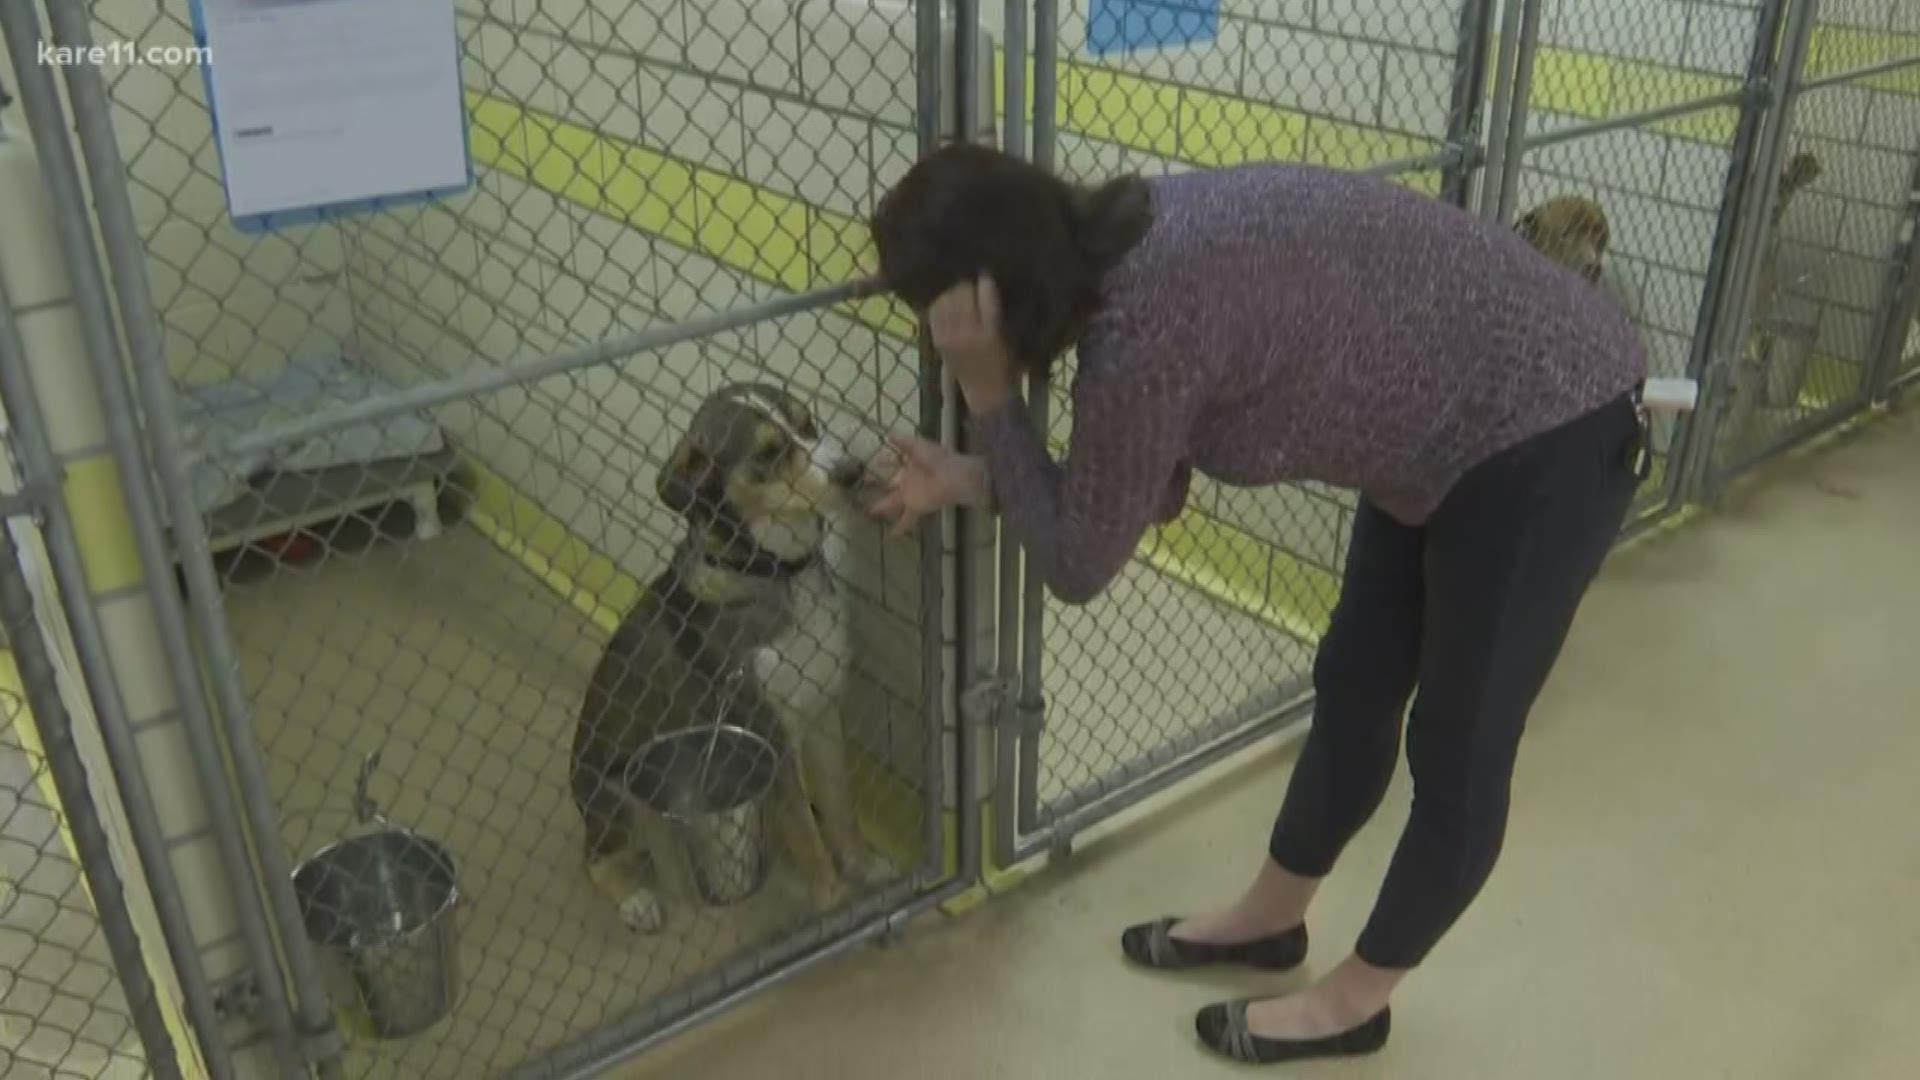 St Paul Animal Humane Society Closing Donations Needed Kare11 Com